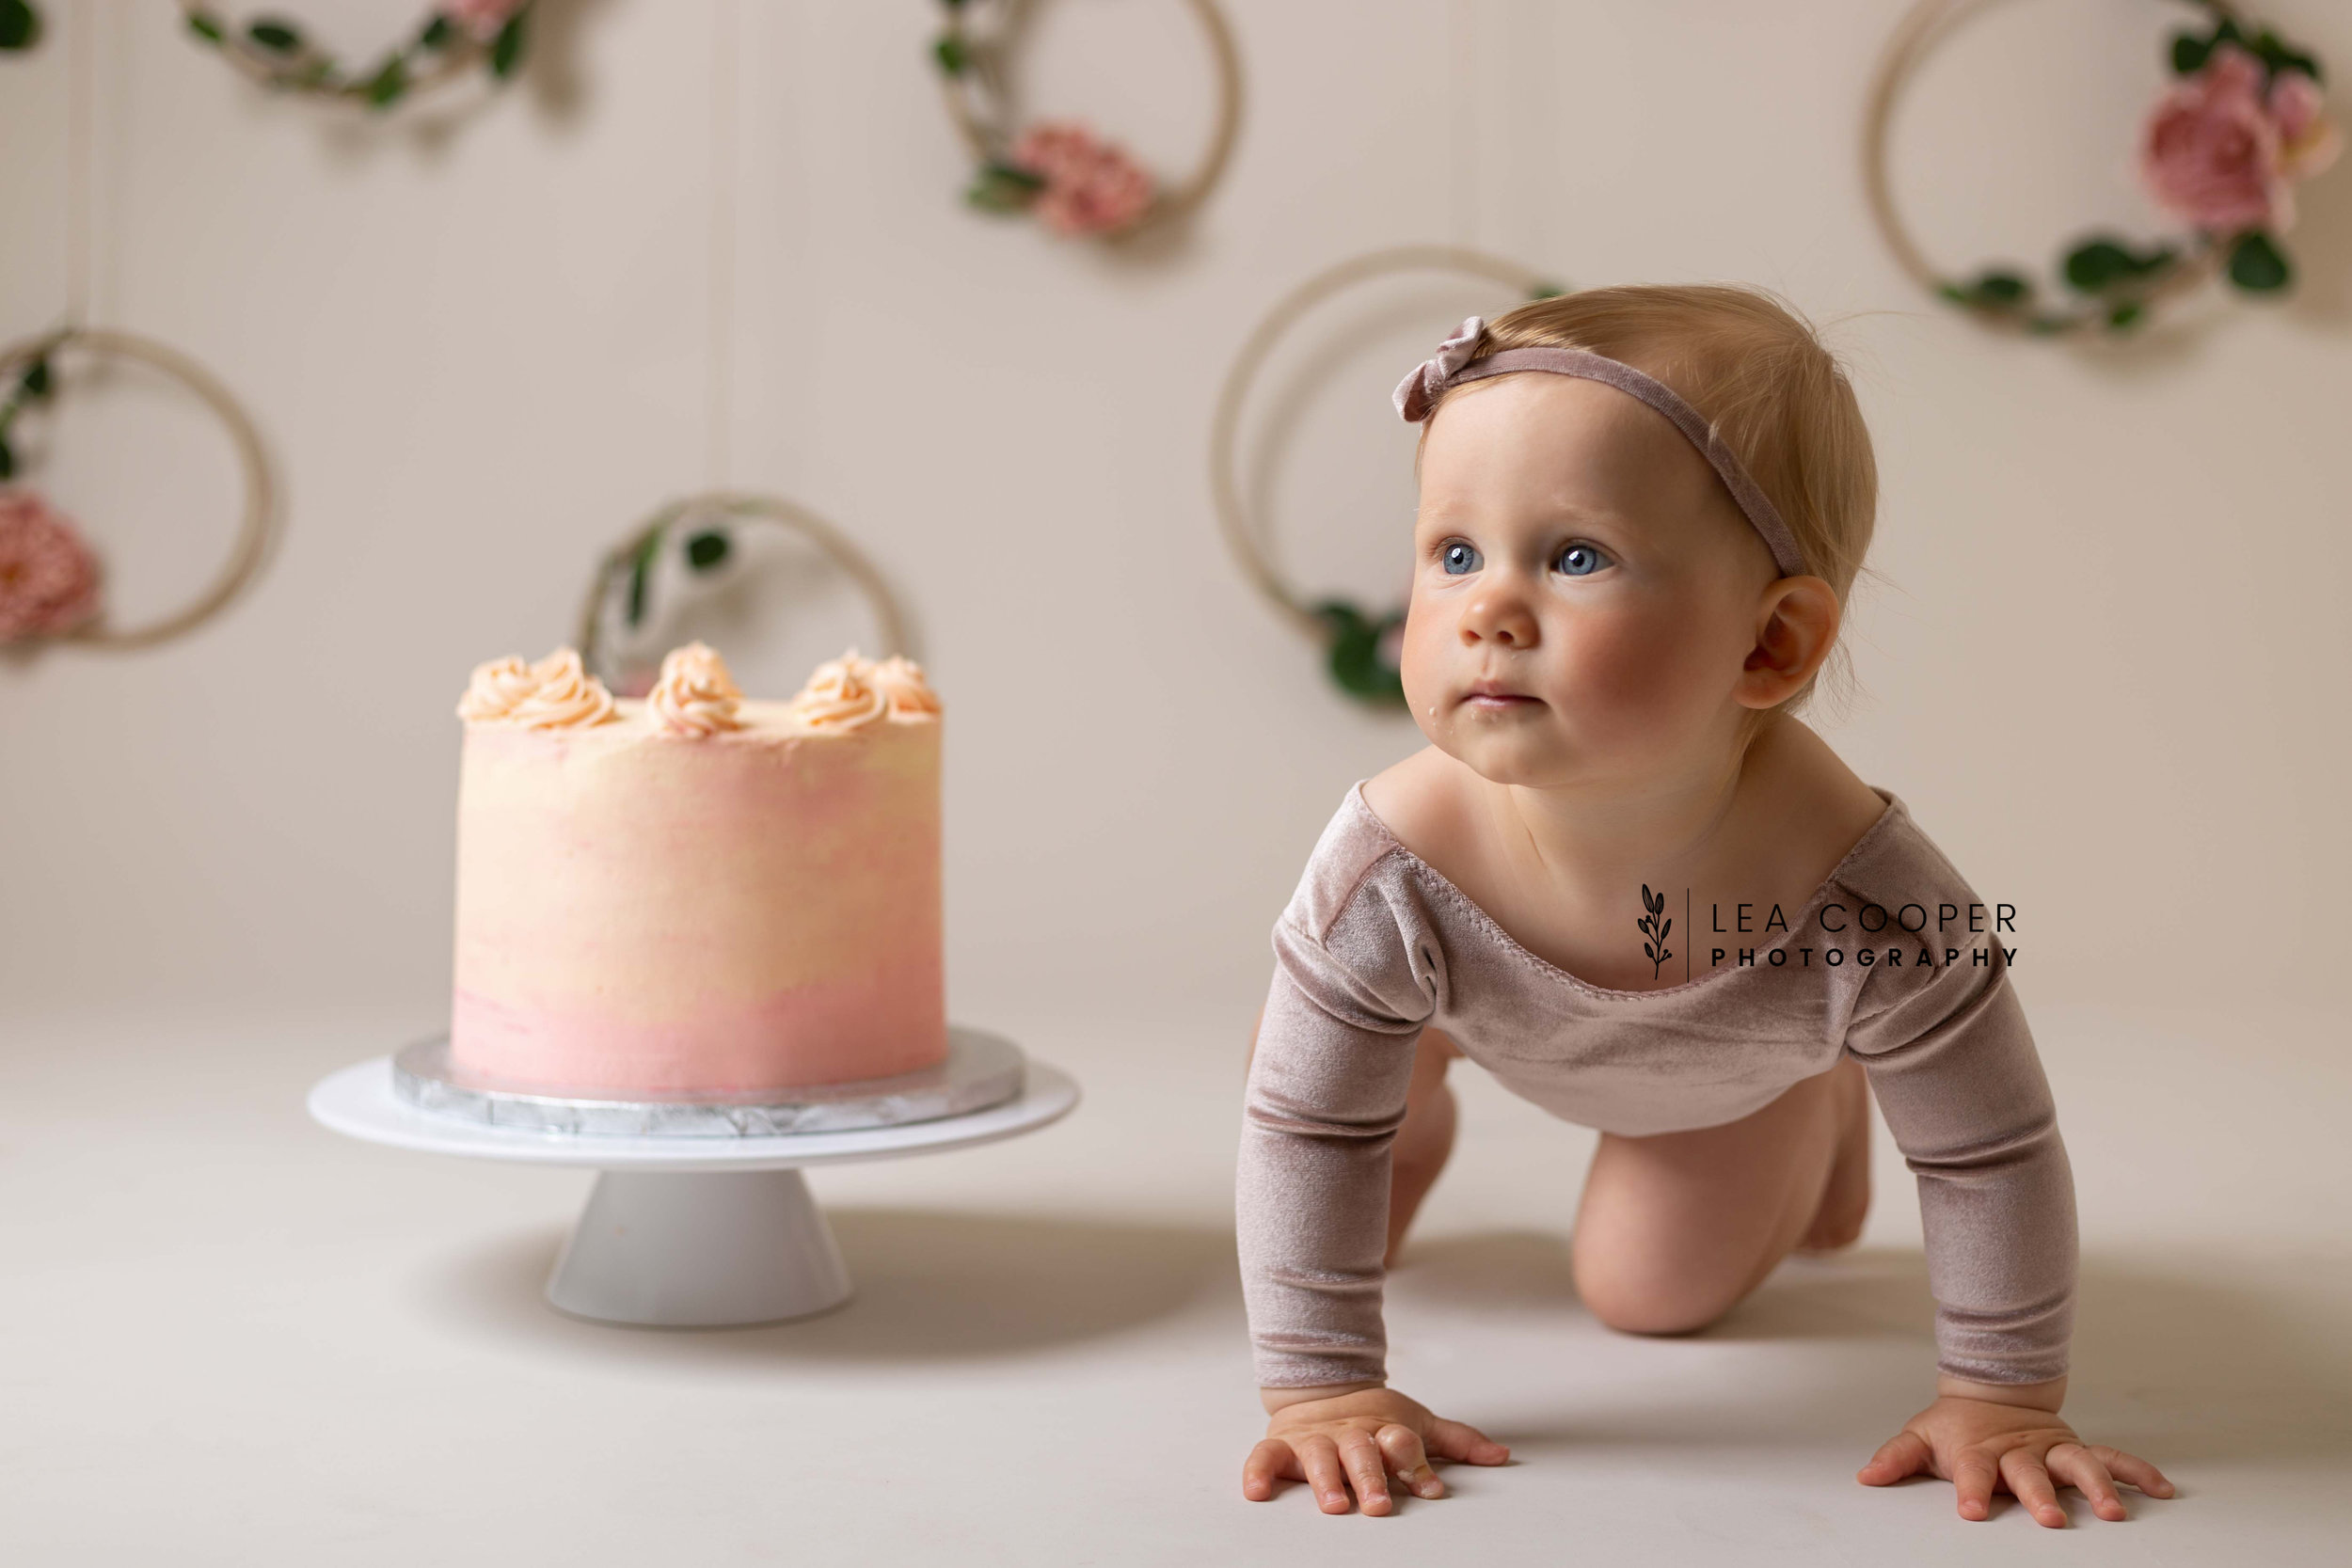 LEA-COOPER-PHOTOGRAPHY-CAKE-SMASH-PHOTOS-BIRTHDAY-PICTURES-WILLENHALL-WEST-MIDLANDS-SPLASH-CHILD-PHOTOGRAPHY-PORTRAIT-WEST-MIDLANDS-WOLVERHAMPTON-8.jpg